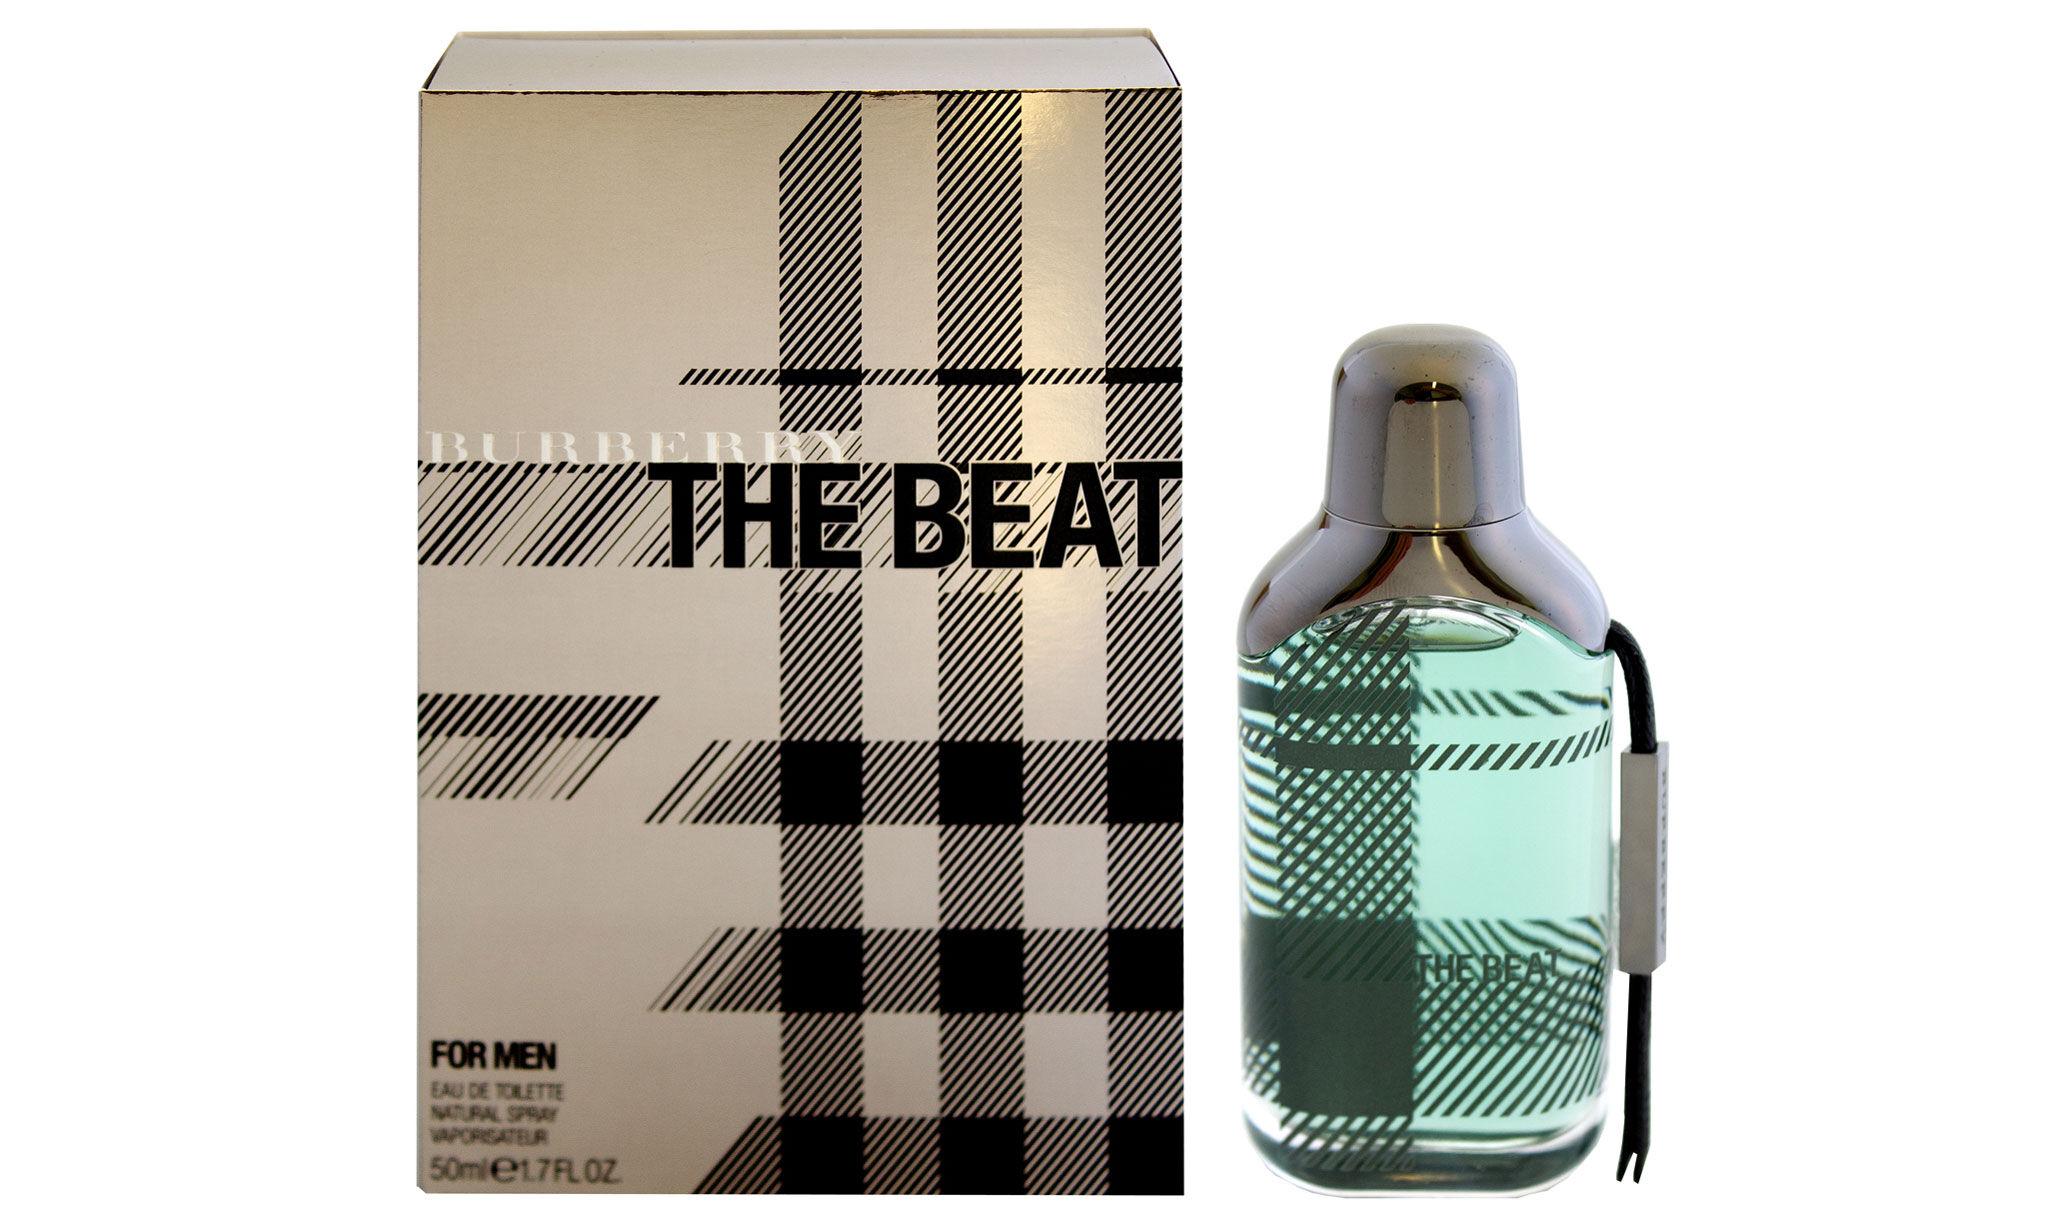 Burberry Eau de Toilette da 50 ml Burberry The Beat for Men